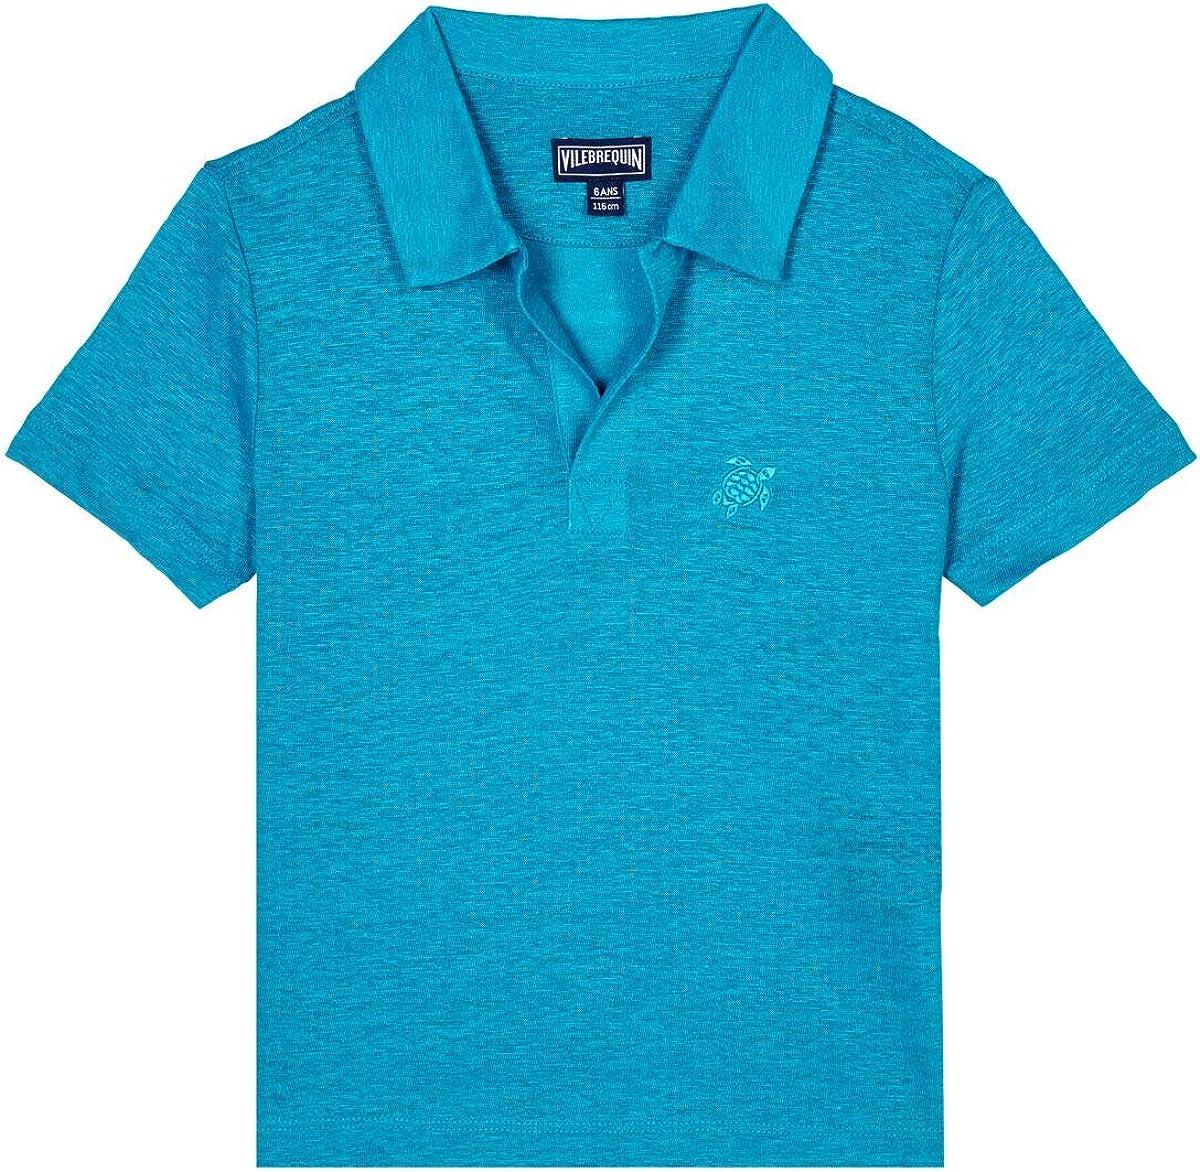 Vilebrequin, Linen Boys Polo Shirt Solid